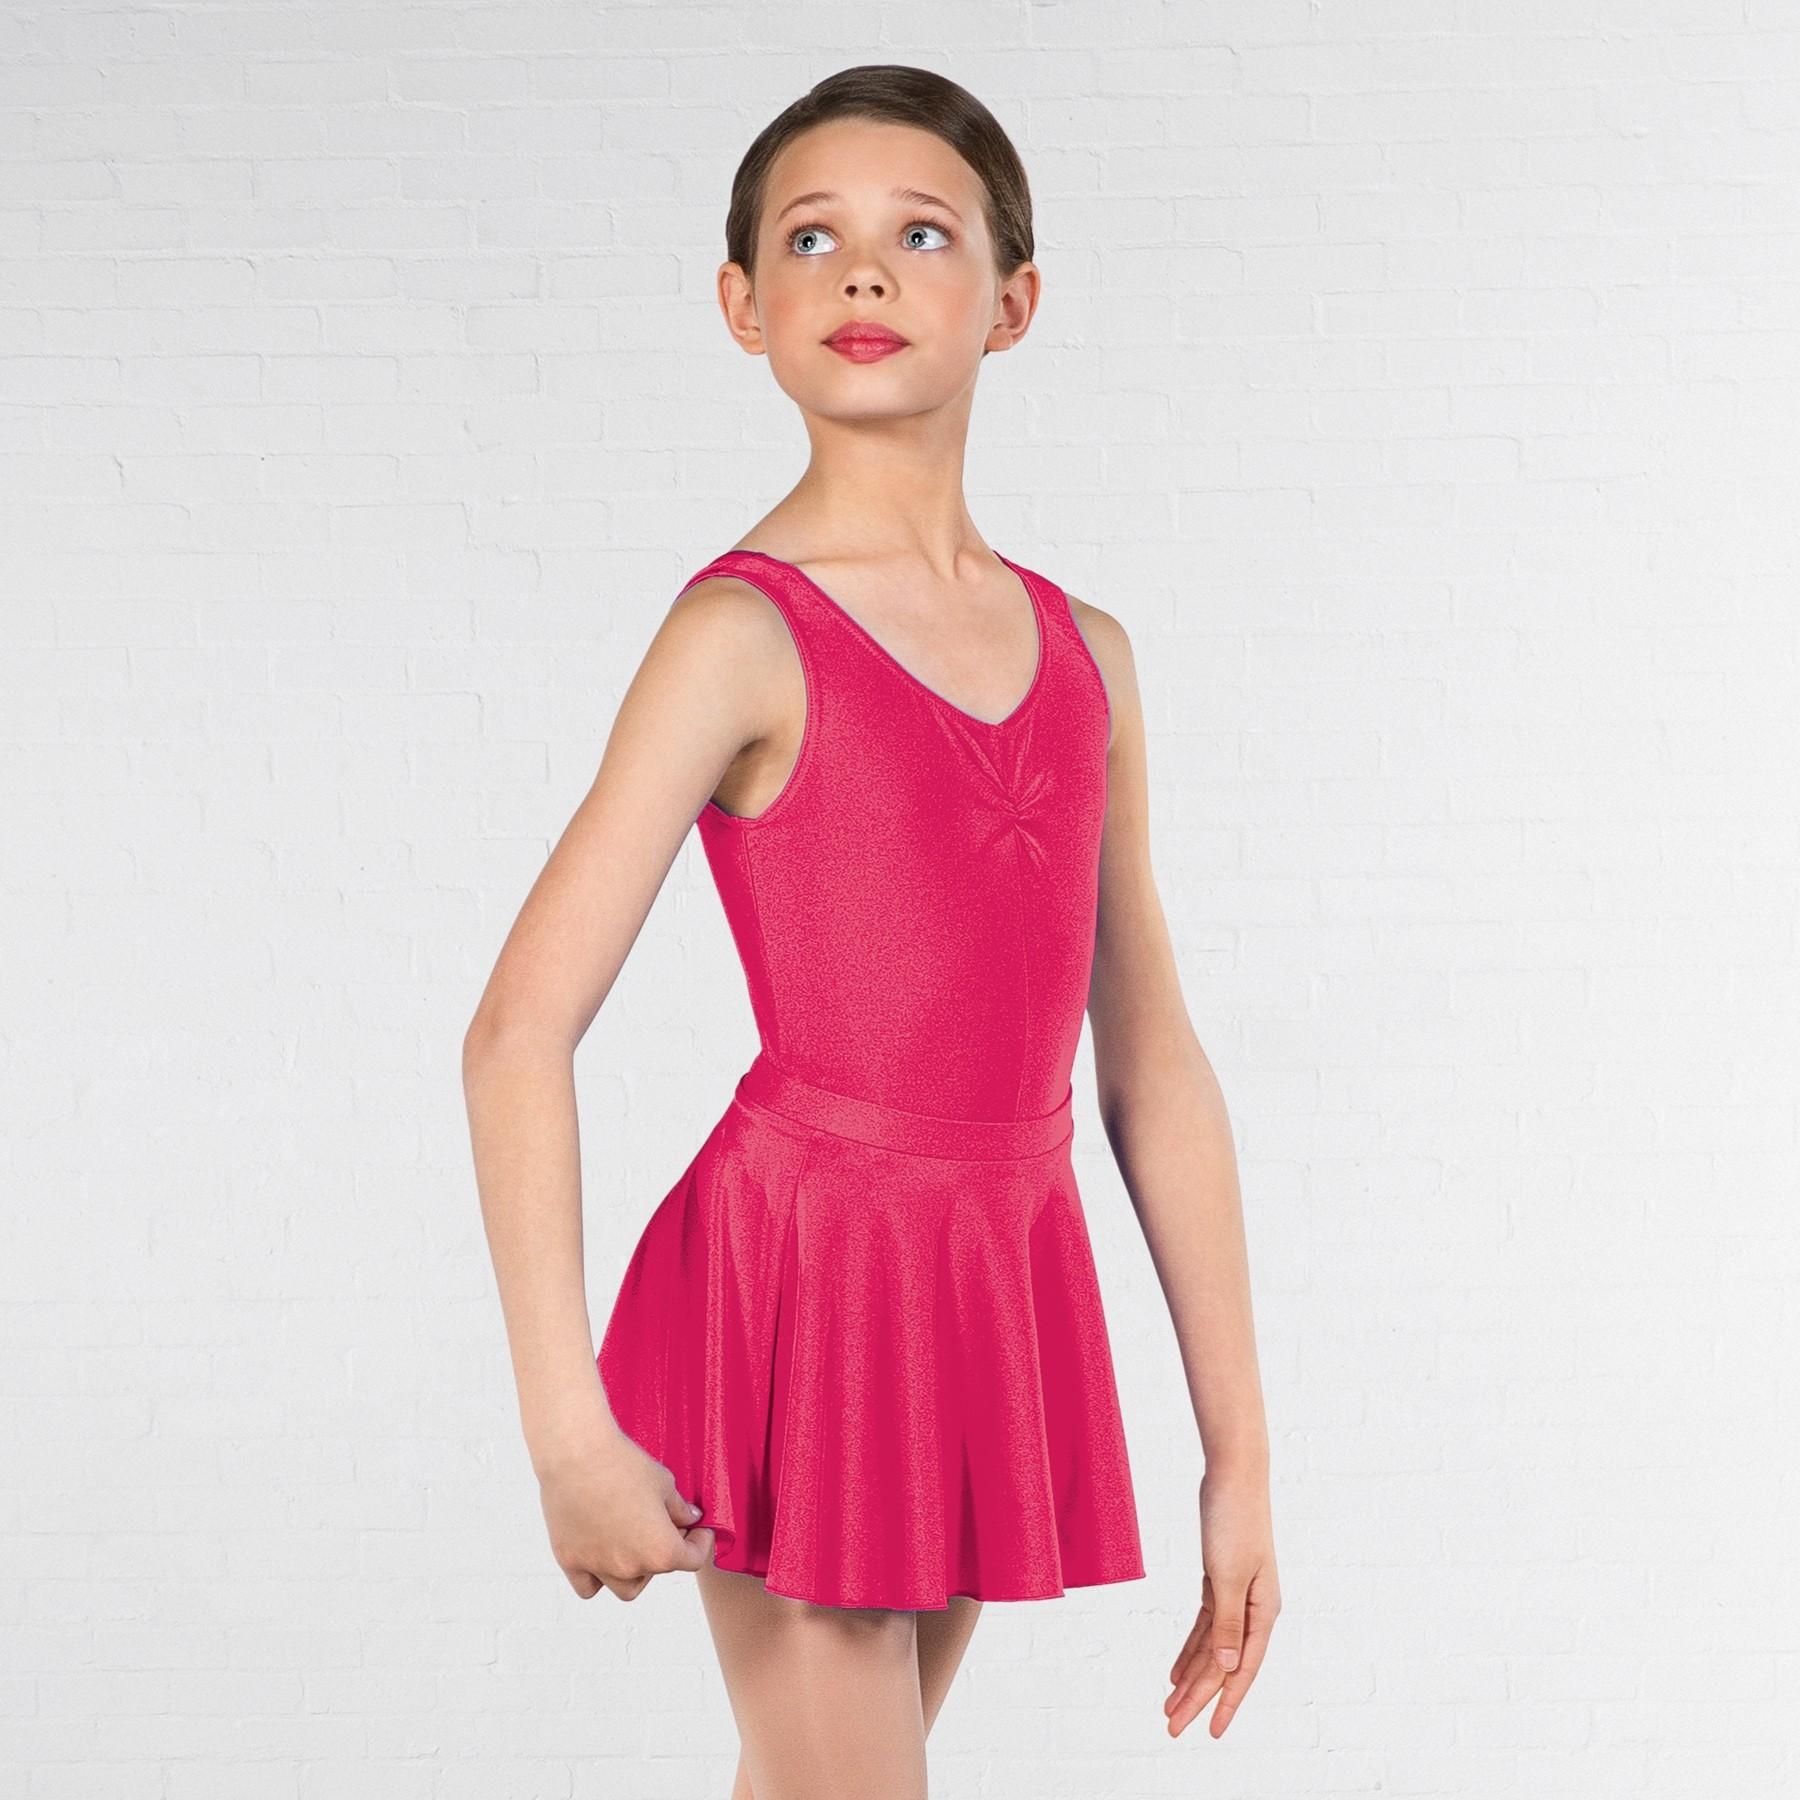 1st Position Circular Skirt (Cerise)